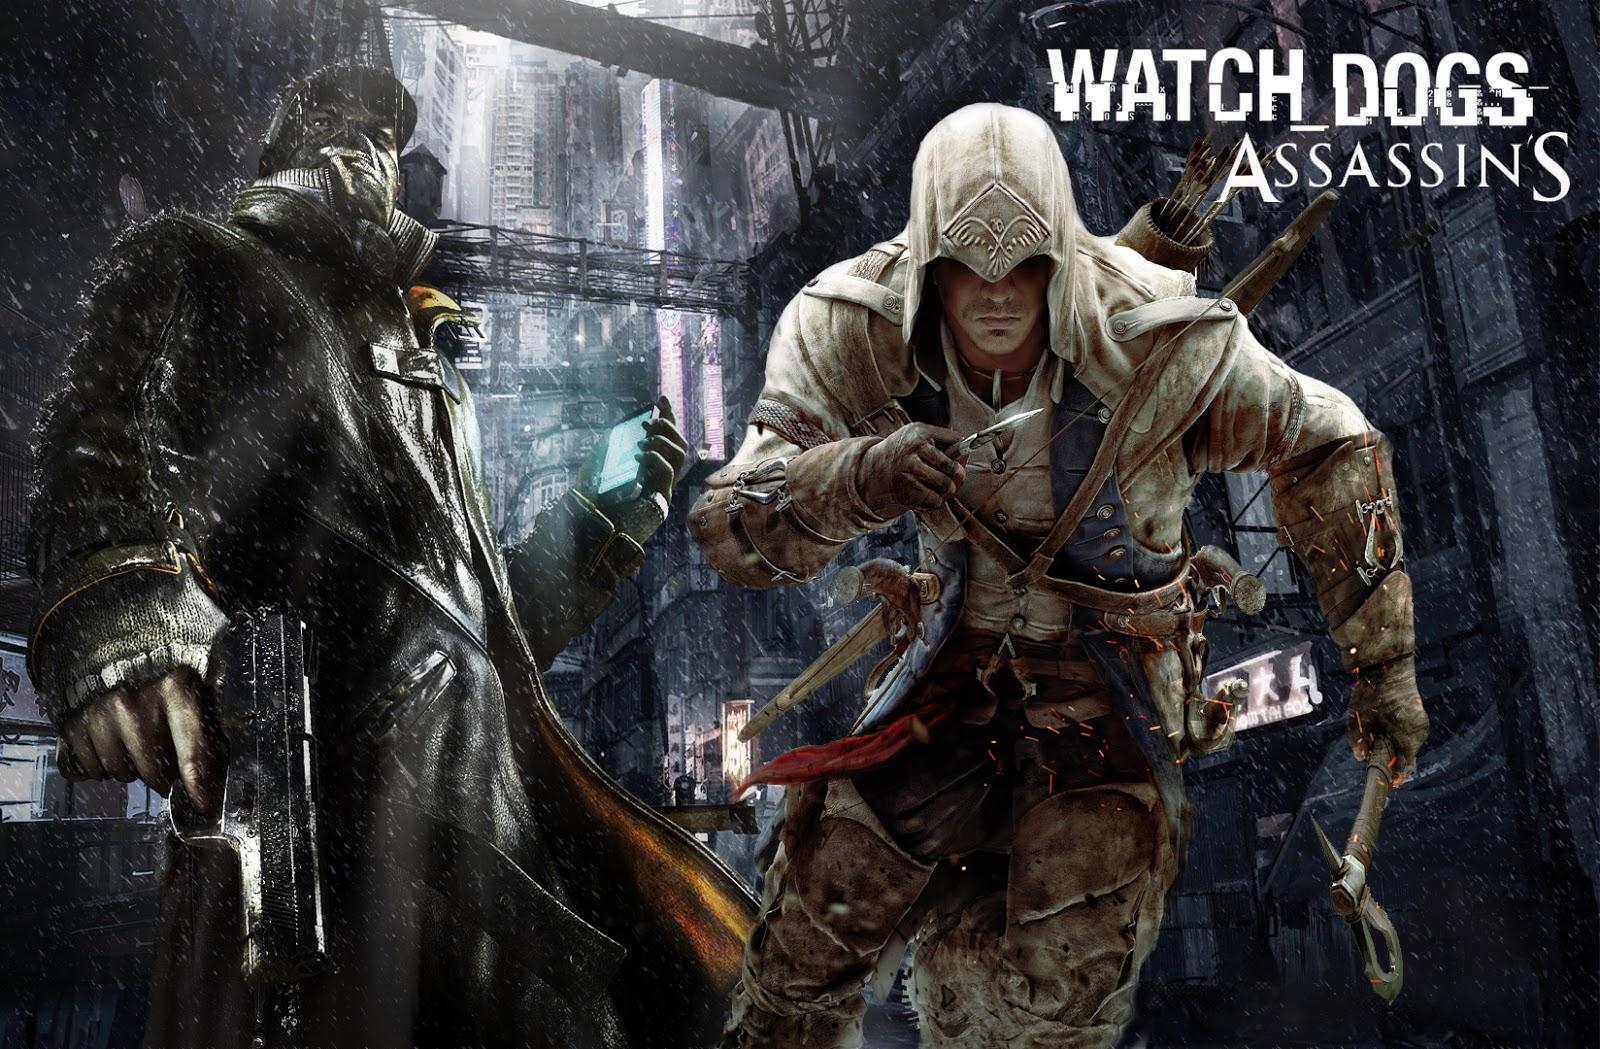 Assassins creeds watch dogs nintendo wii u